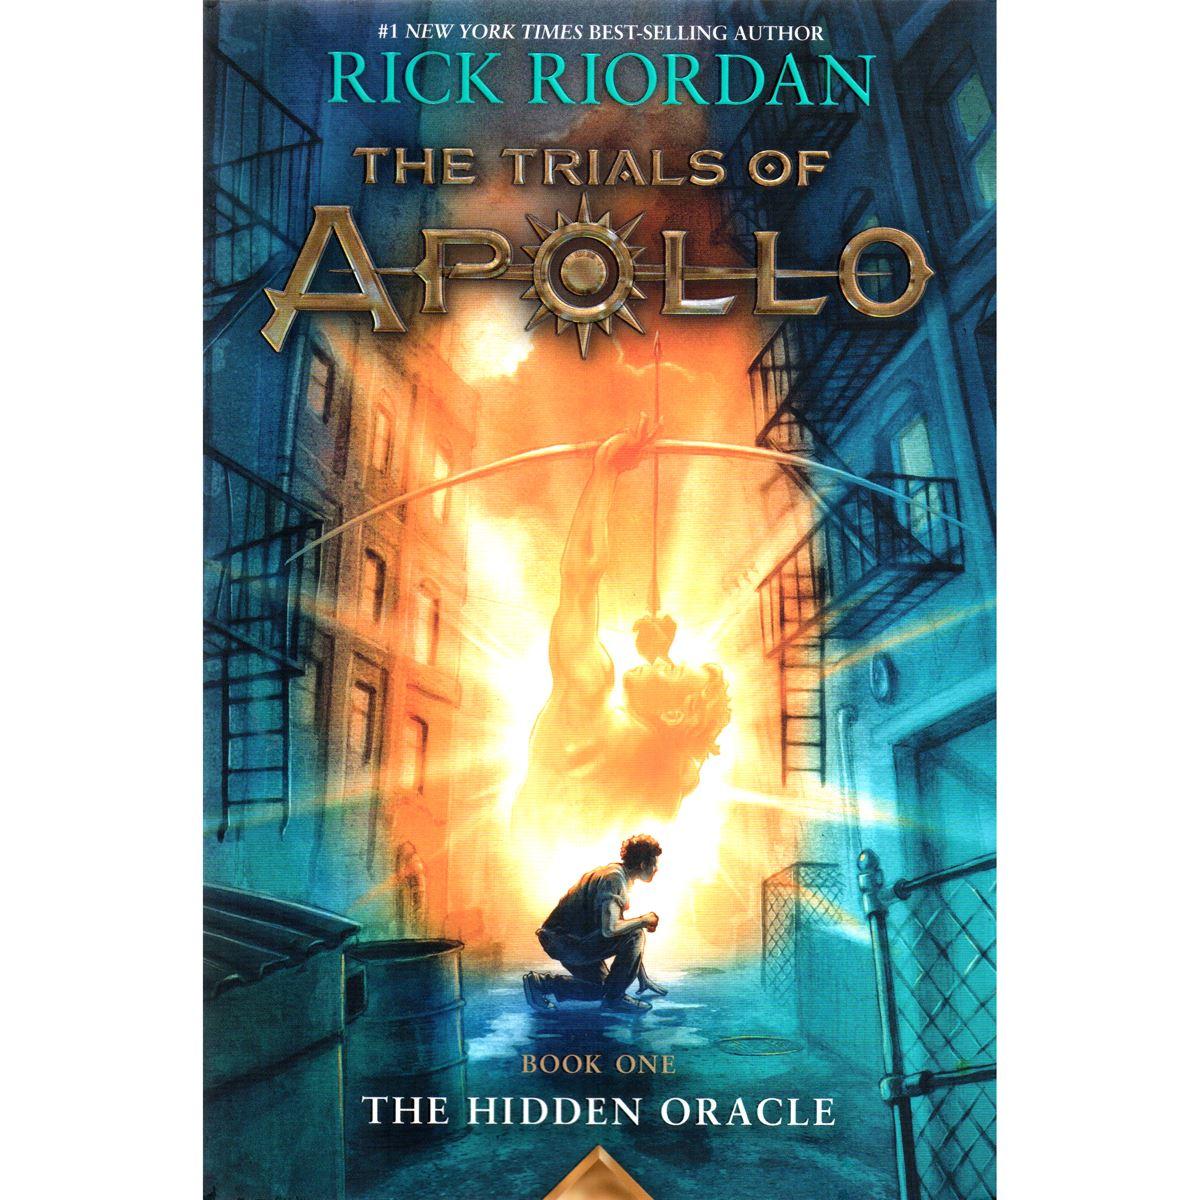 The hidden oracle: the trials of apollo, book one Libro - Sanborns